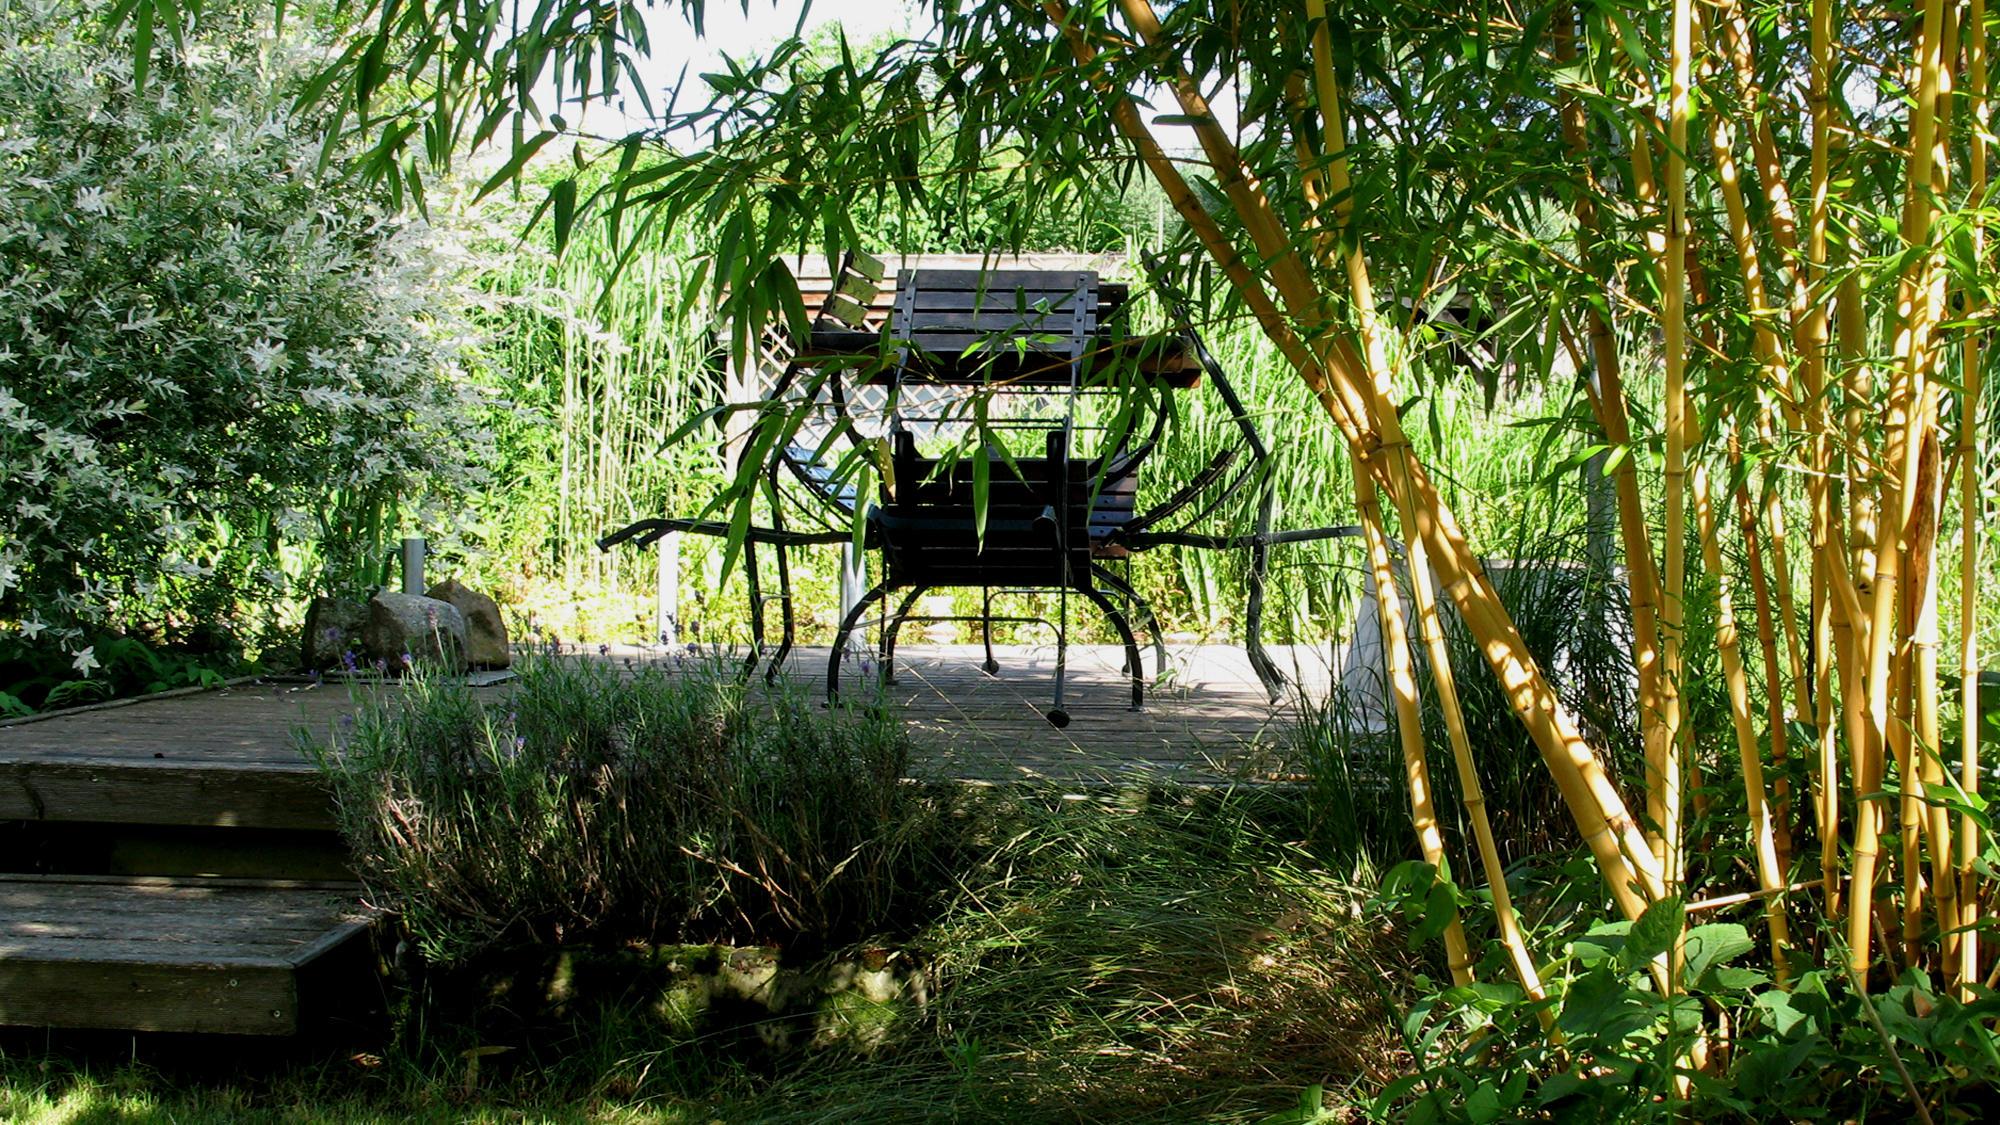 Heike_Bogatzki_Gartengestaltung_Modernisierung.jpg